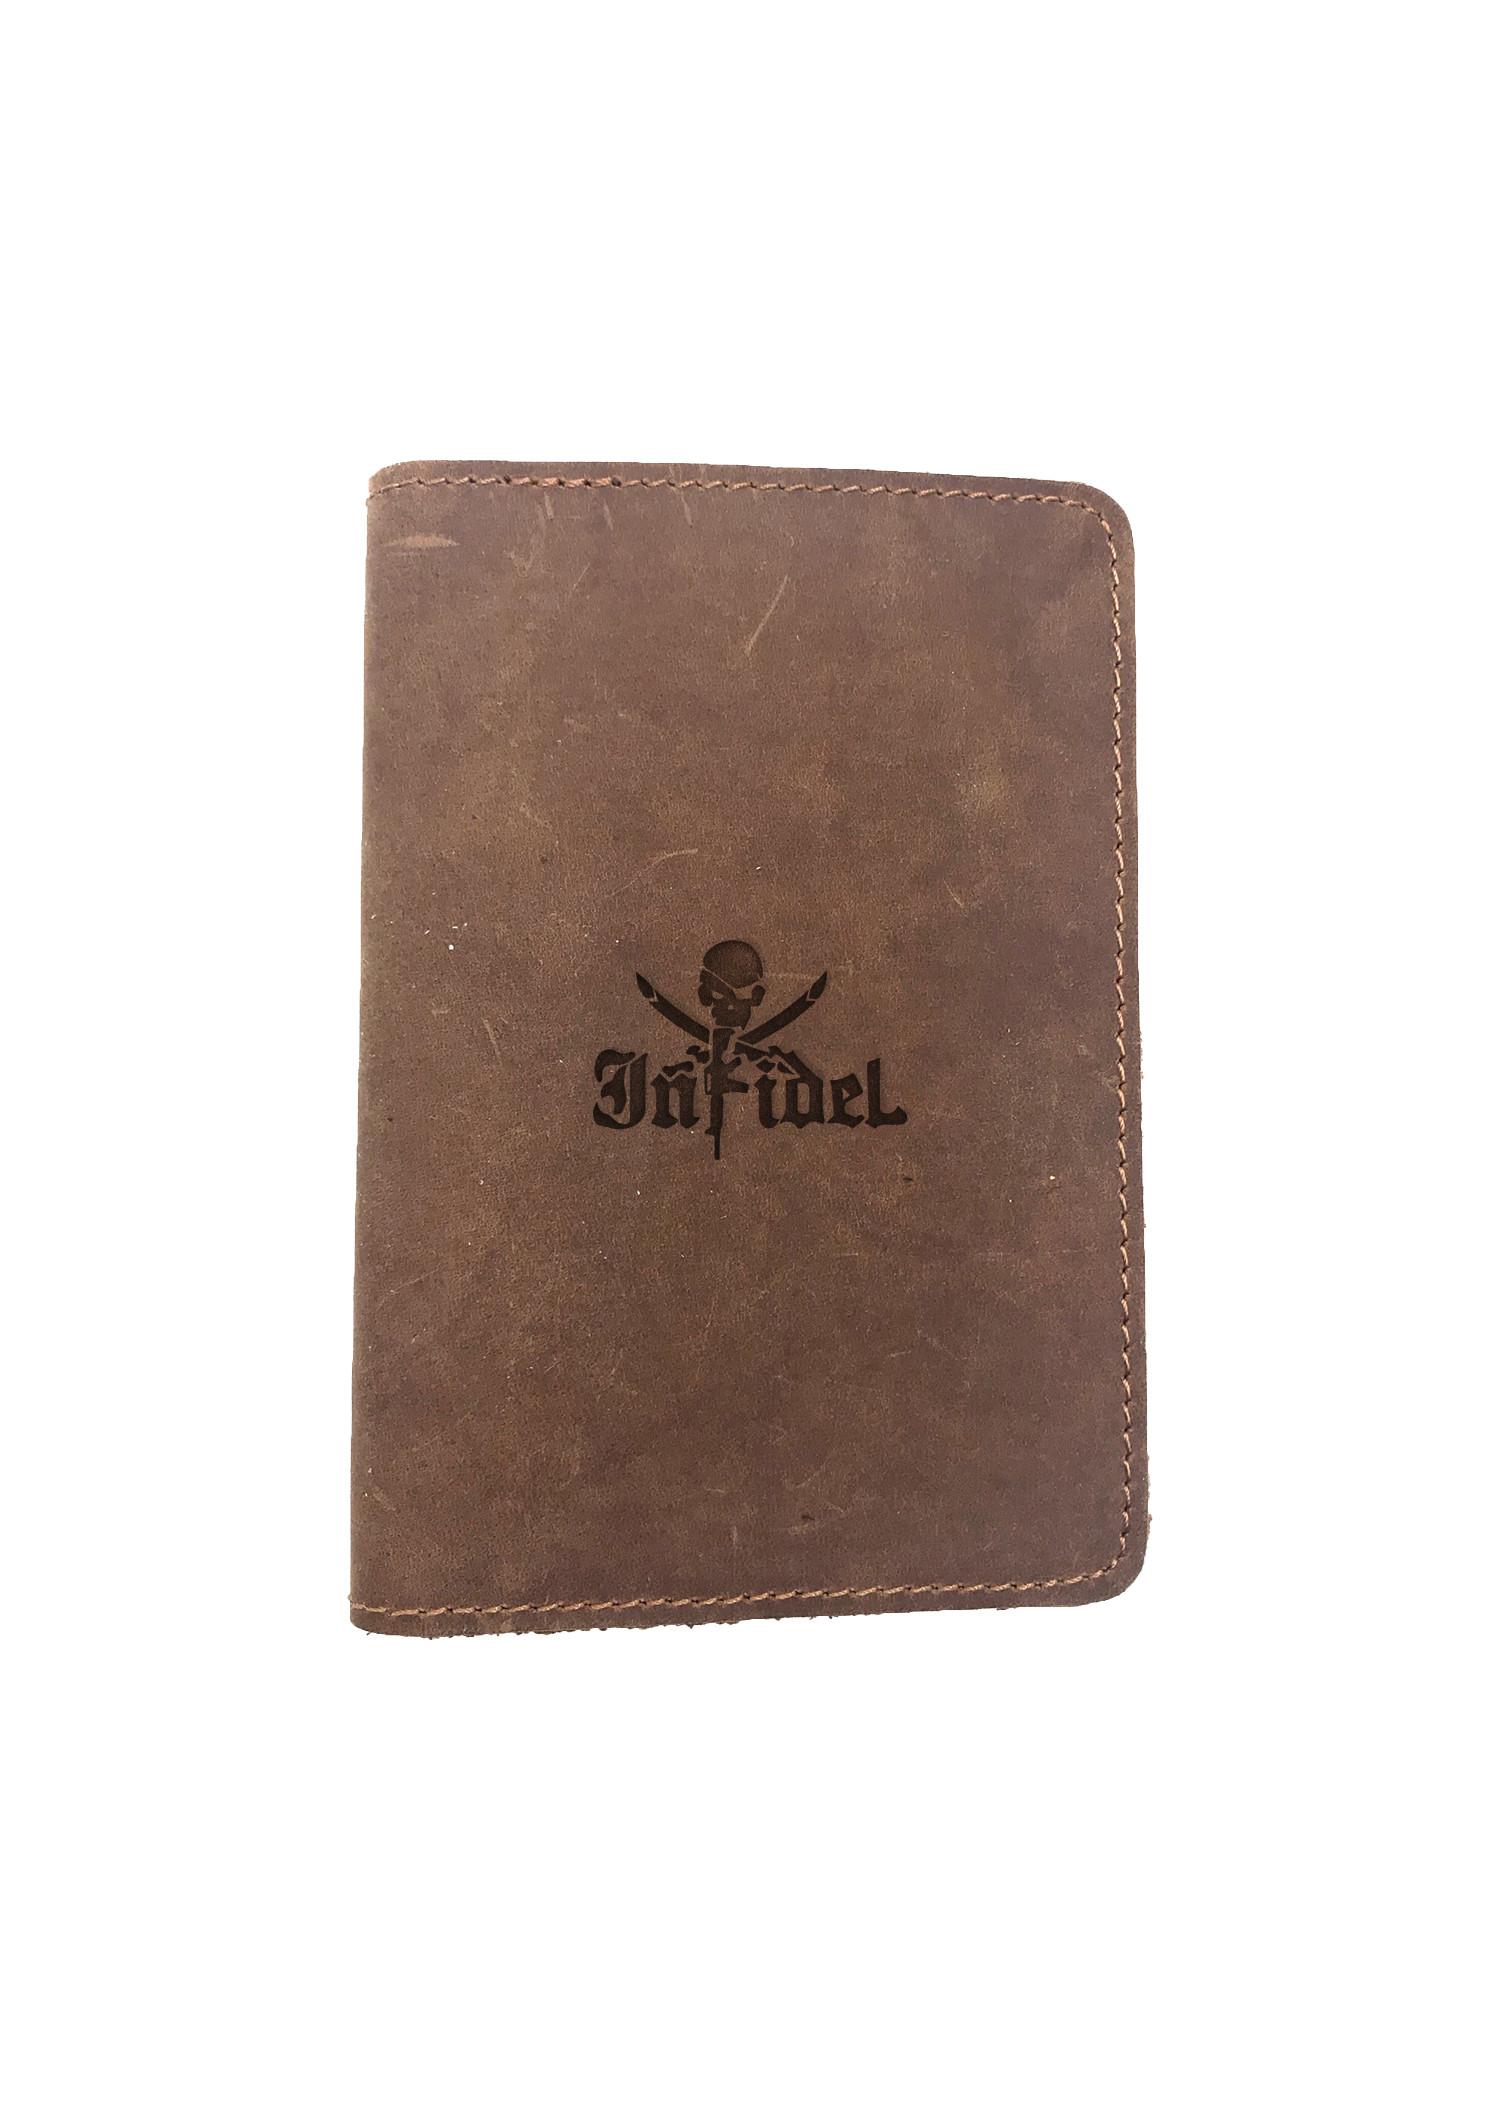 Passport Cover Bao Da Hộ Chiếu Da Sáp Khắc Hình Hình INFIDE STENCIL ART INFIDEL STENCIL ART (BROWN)